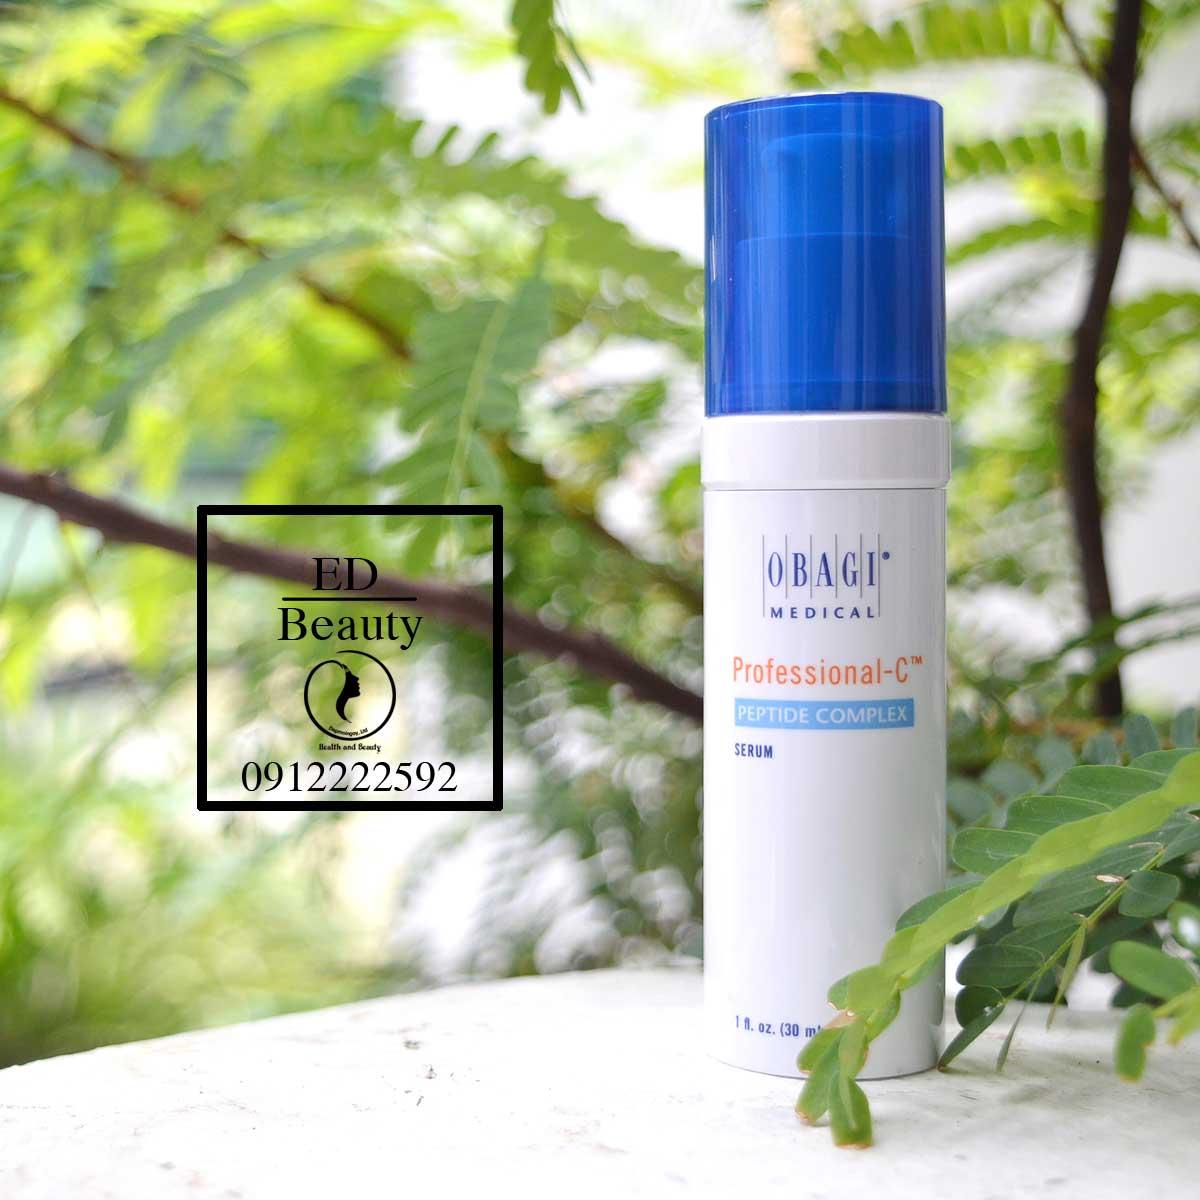 serum-duong-da-tri-lao-hoa-obagi-professional-c-peptide-complex-serum-5-32